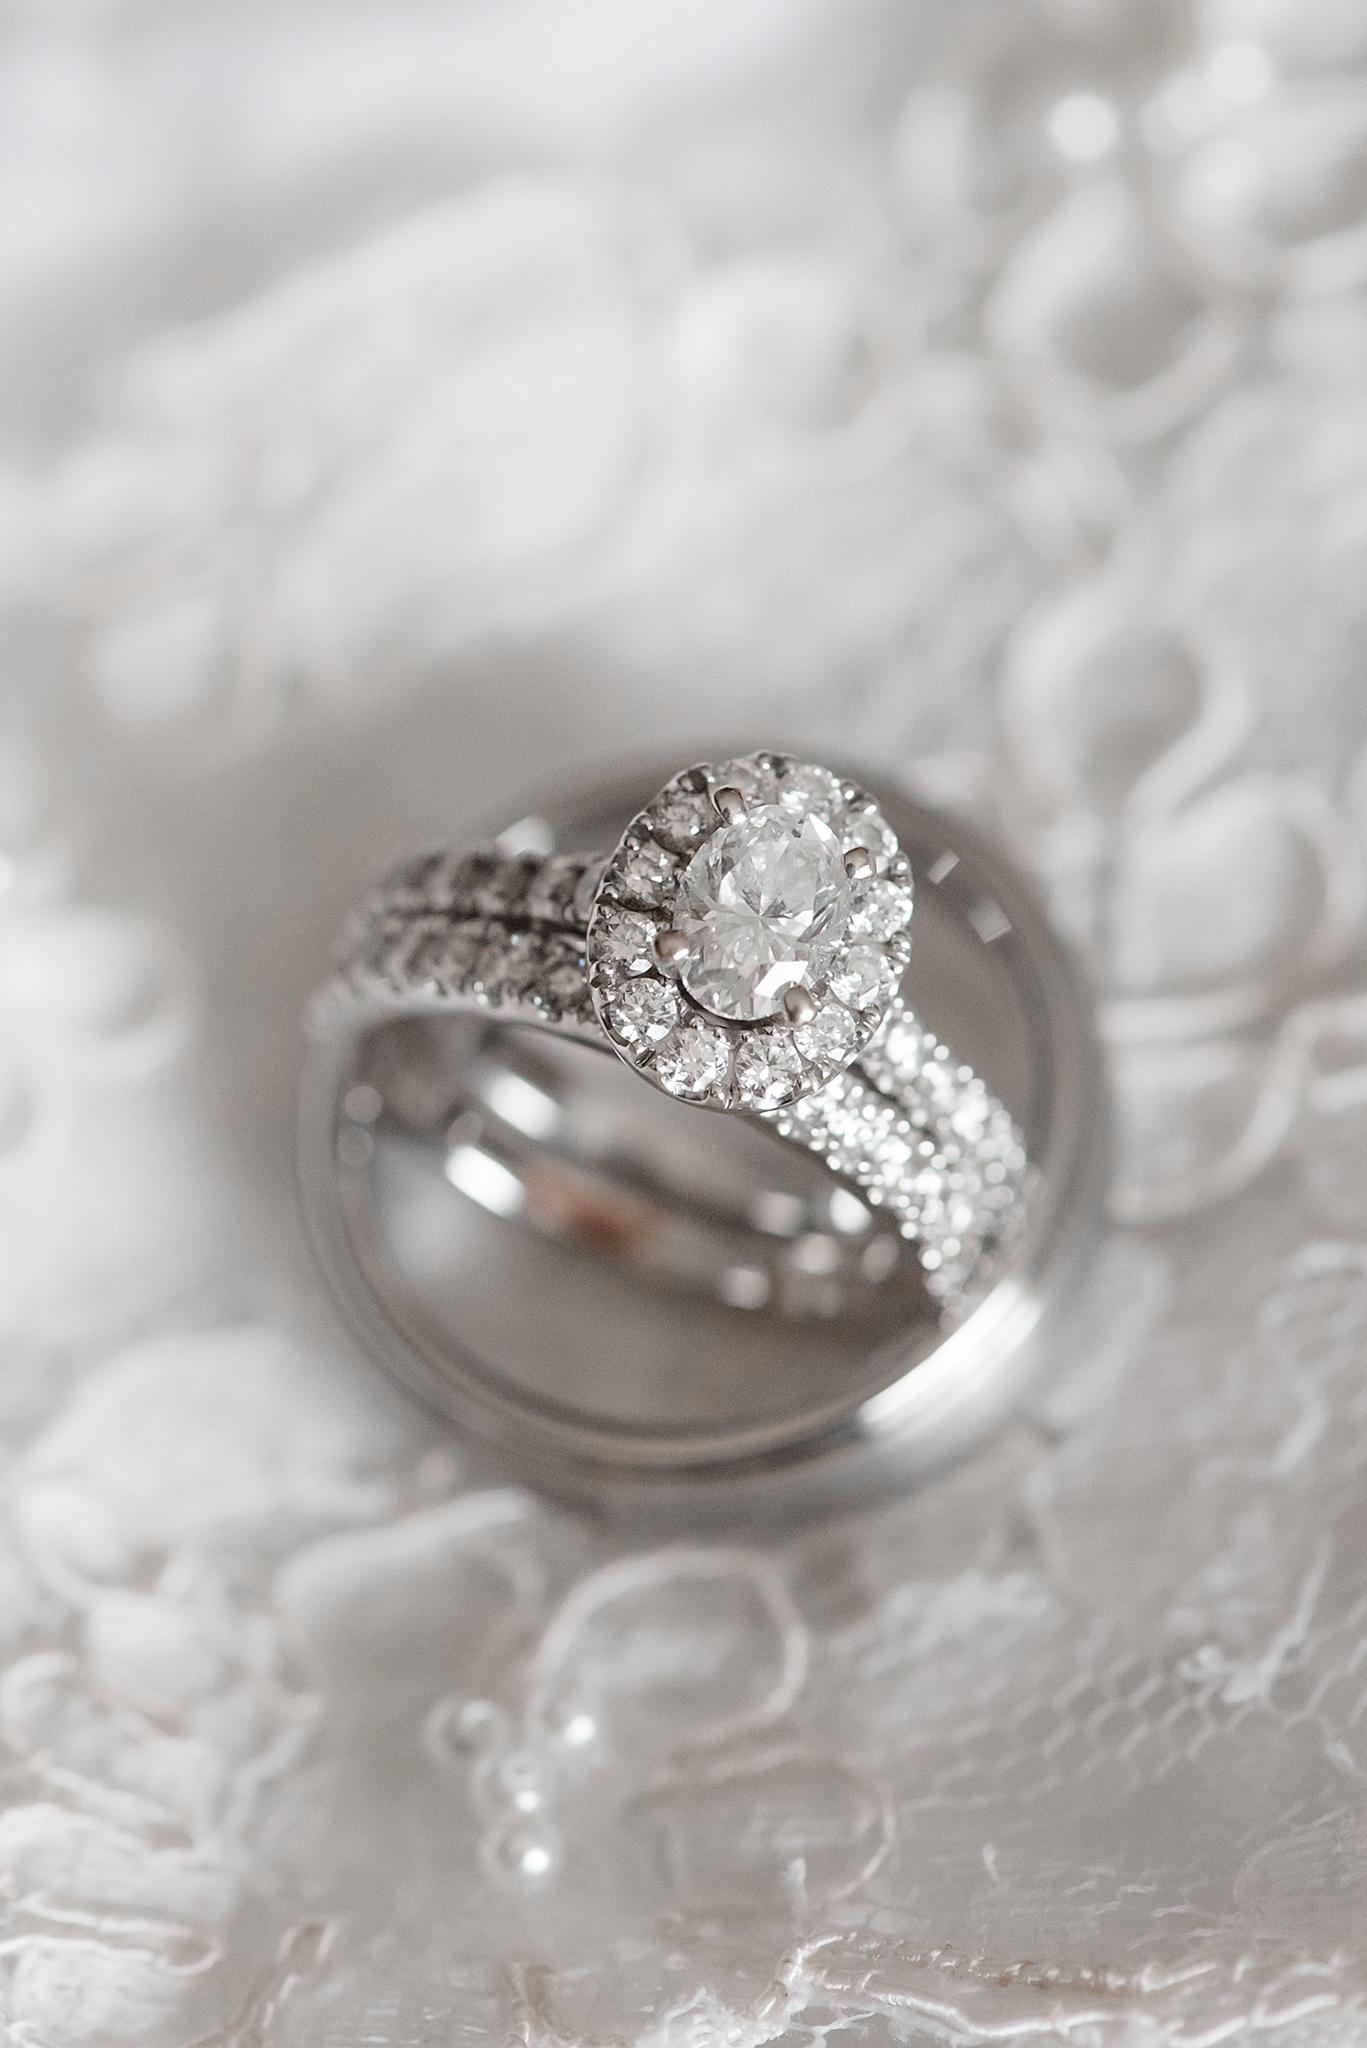 LINDSAY-ADKINS-PHOTOGRAPHY-MICHIGAN-WEDDING-PHOTOGRAPHER-FRANKENMUTH-BREWERY-WEDDING-MICHIGAN-BLOG-5